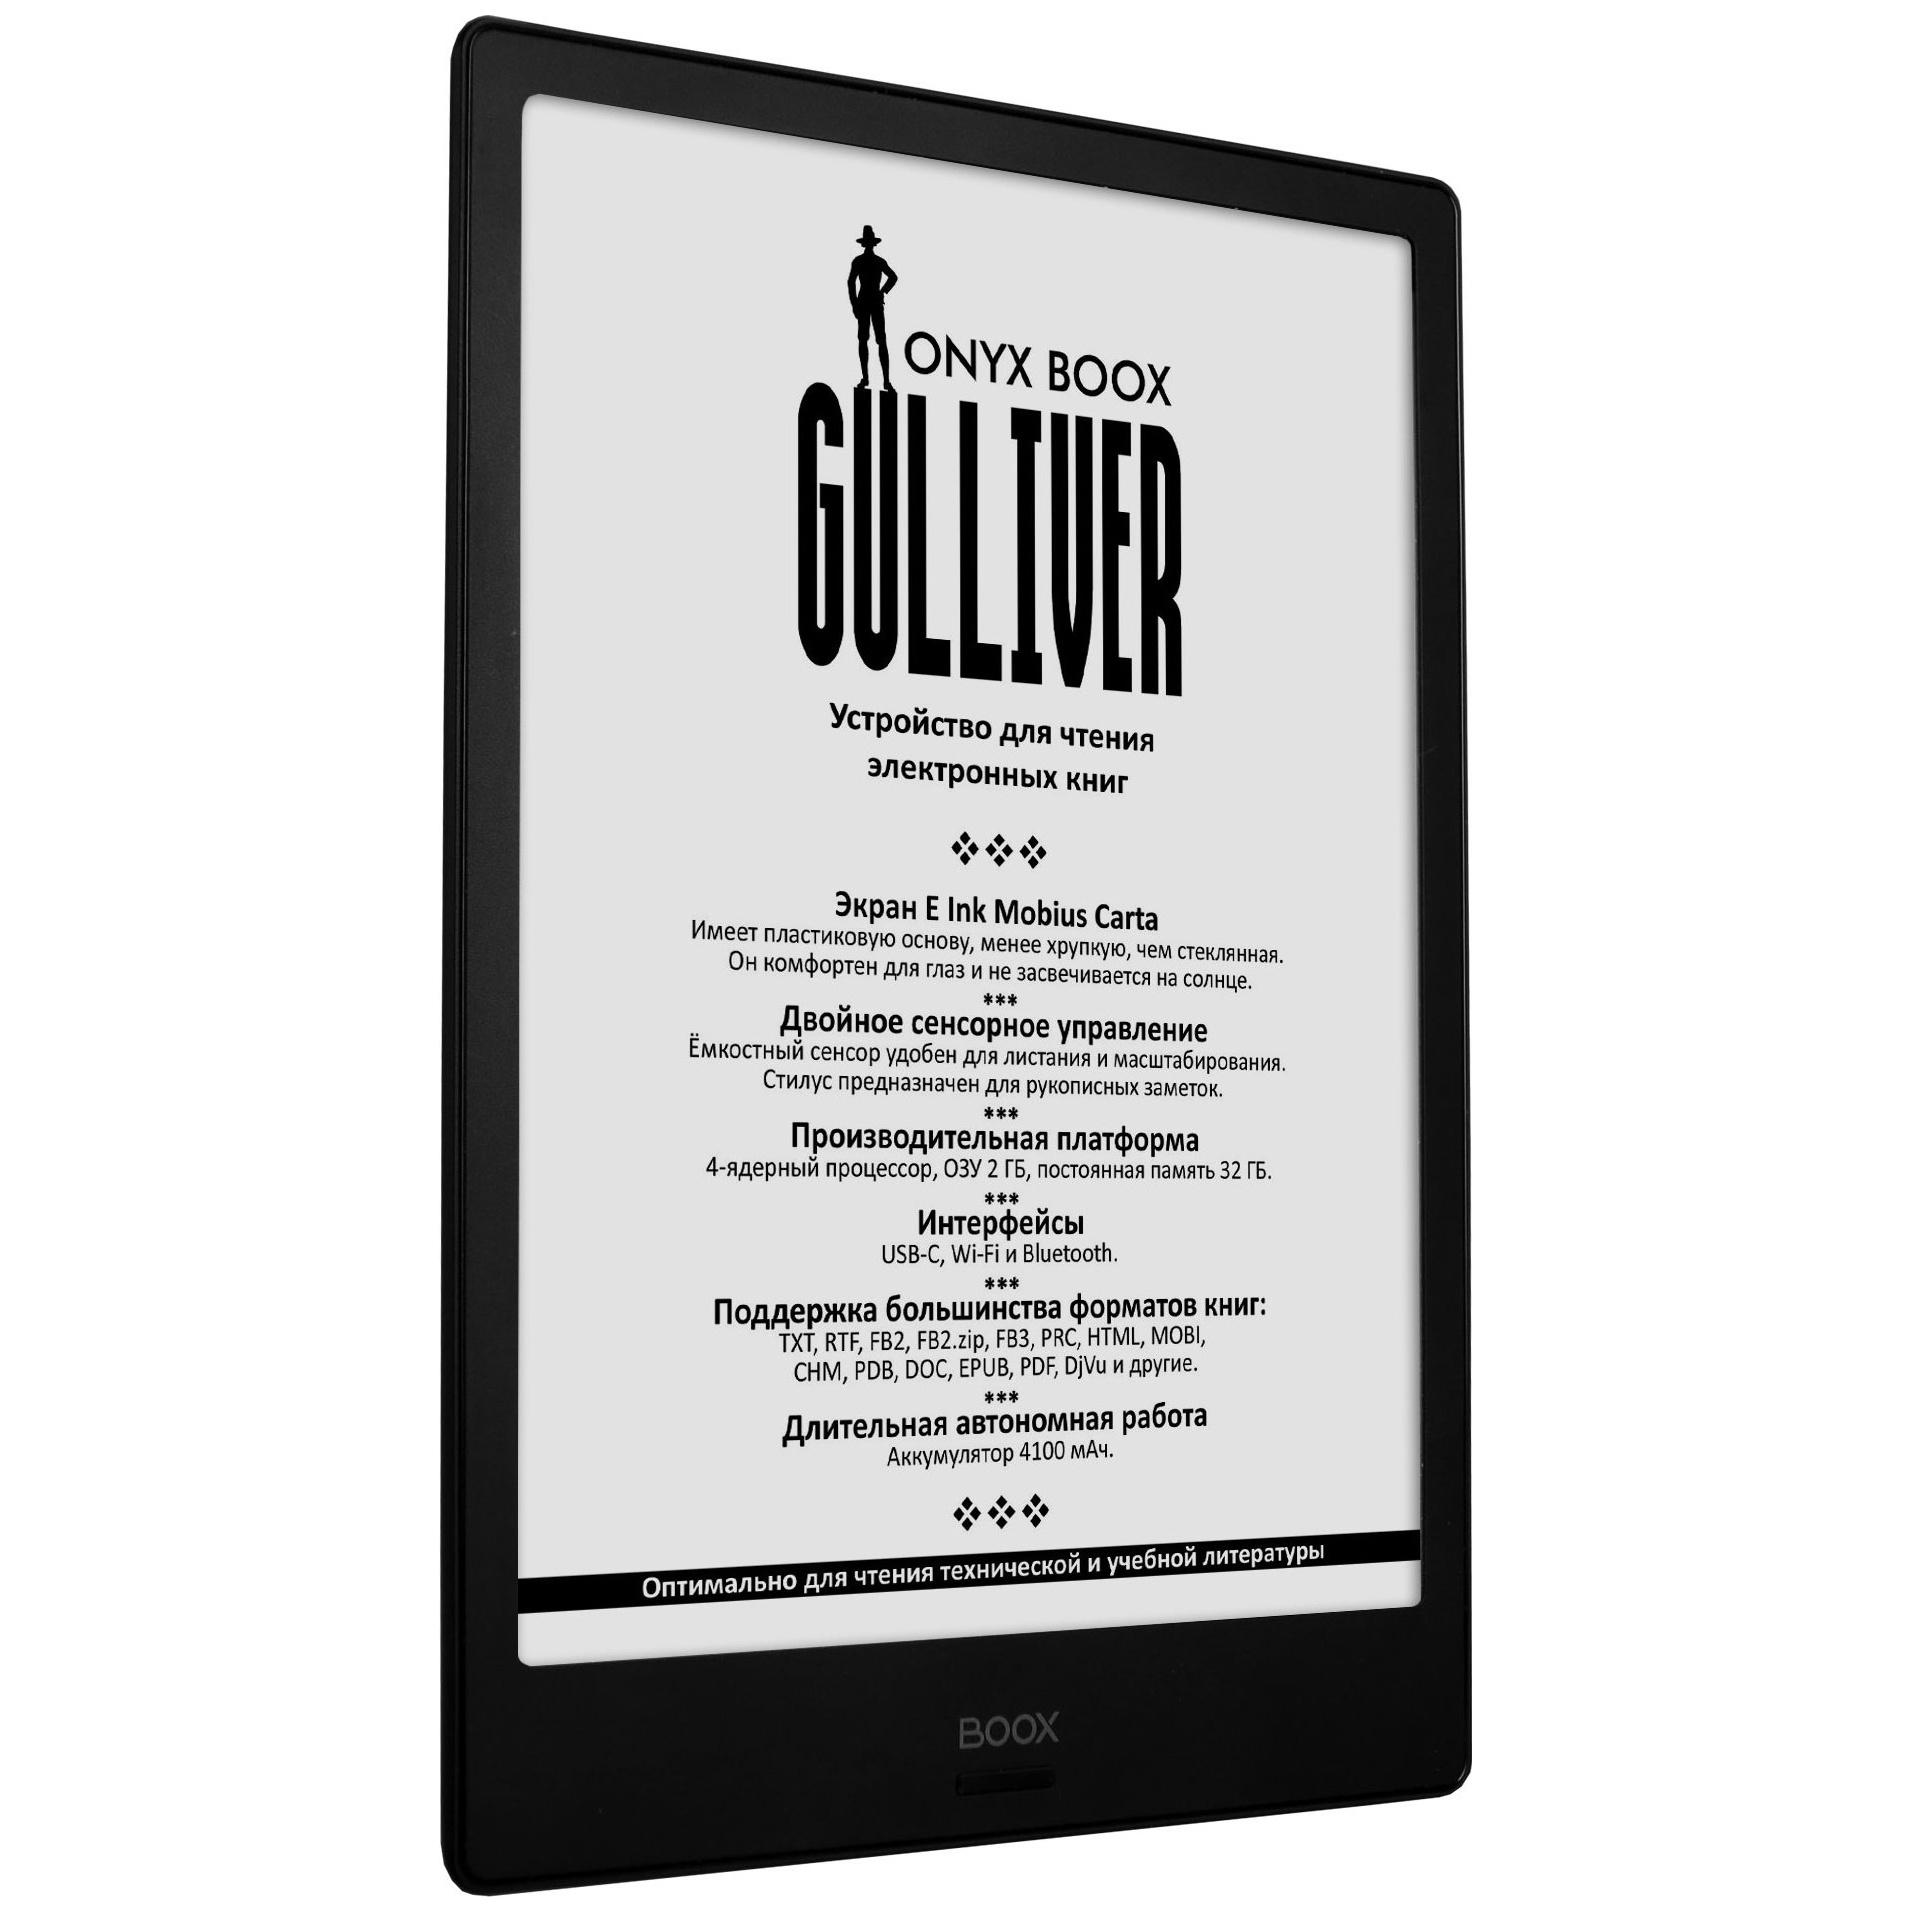 Электронная книга Onyx Boox Gulliver Black